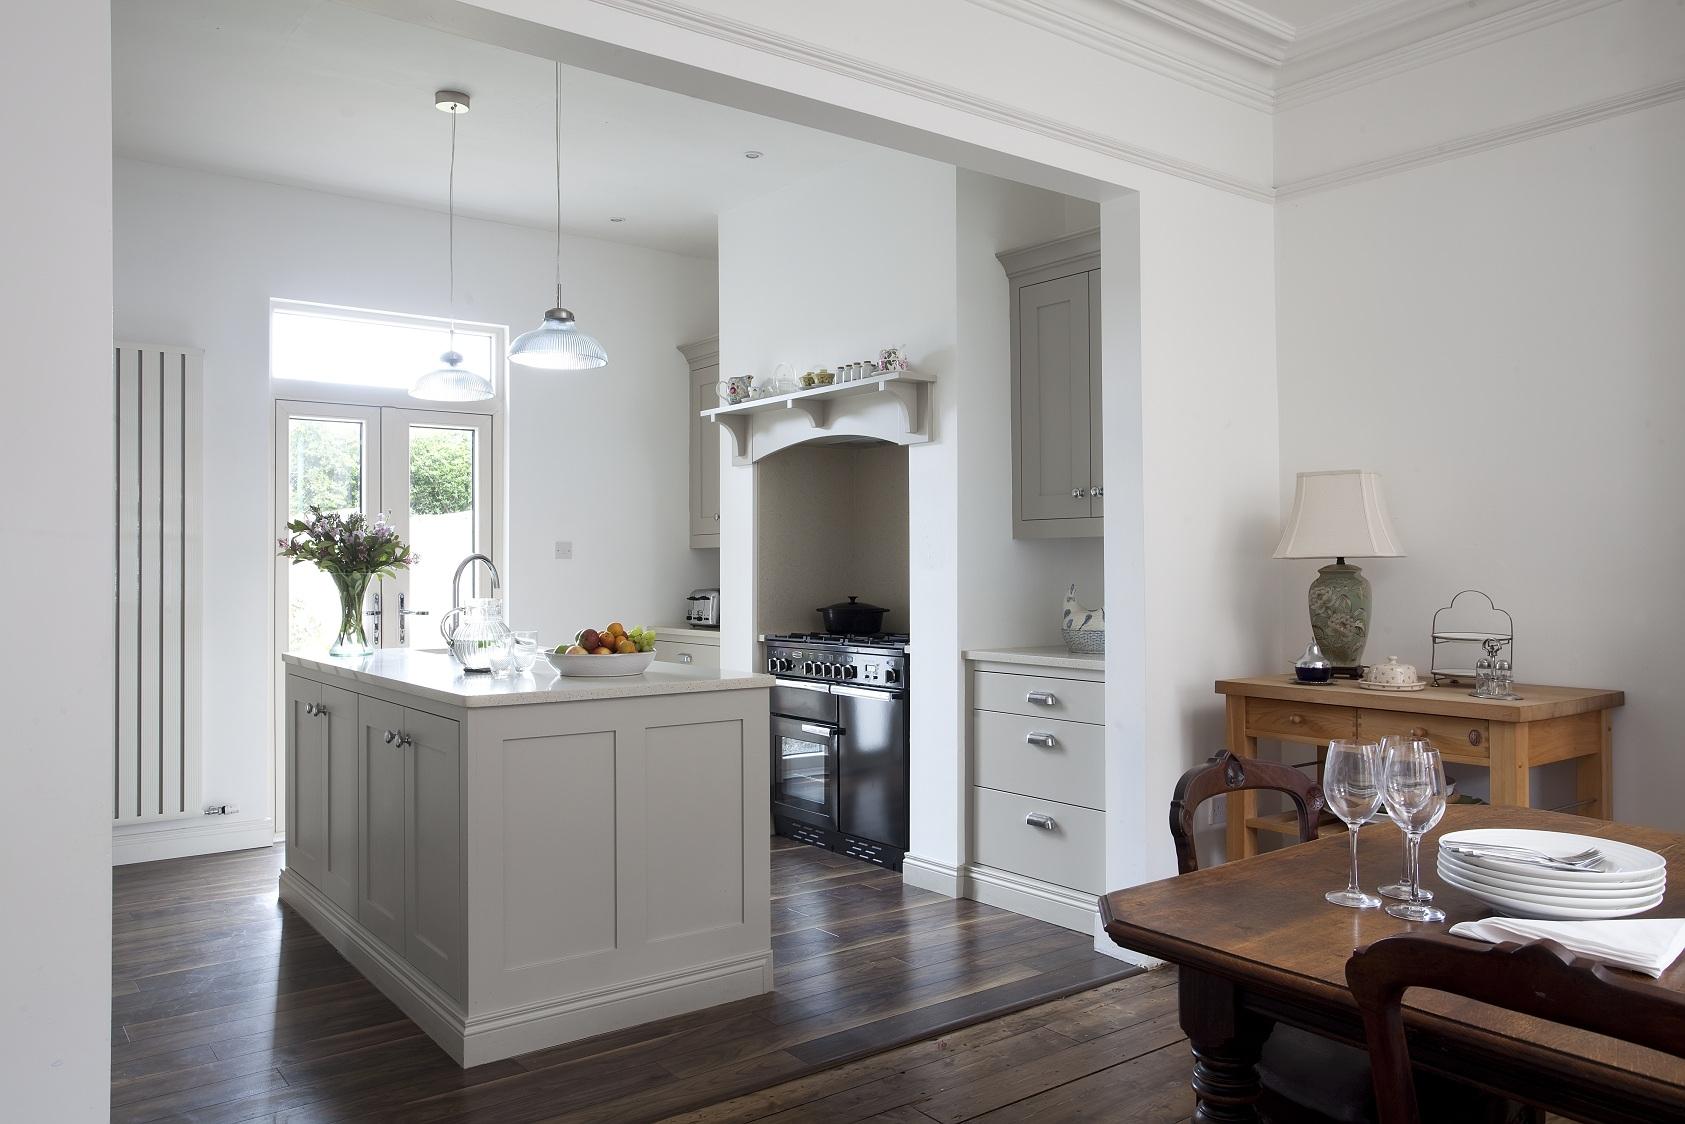 Plain english kitchen design ireland noel dempsey design for Kitchen design ireland